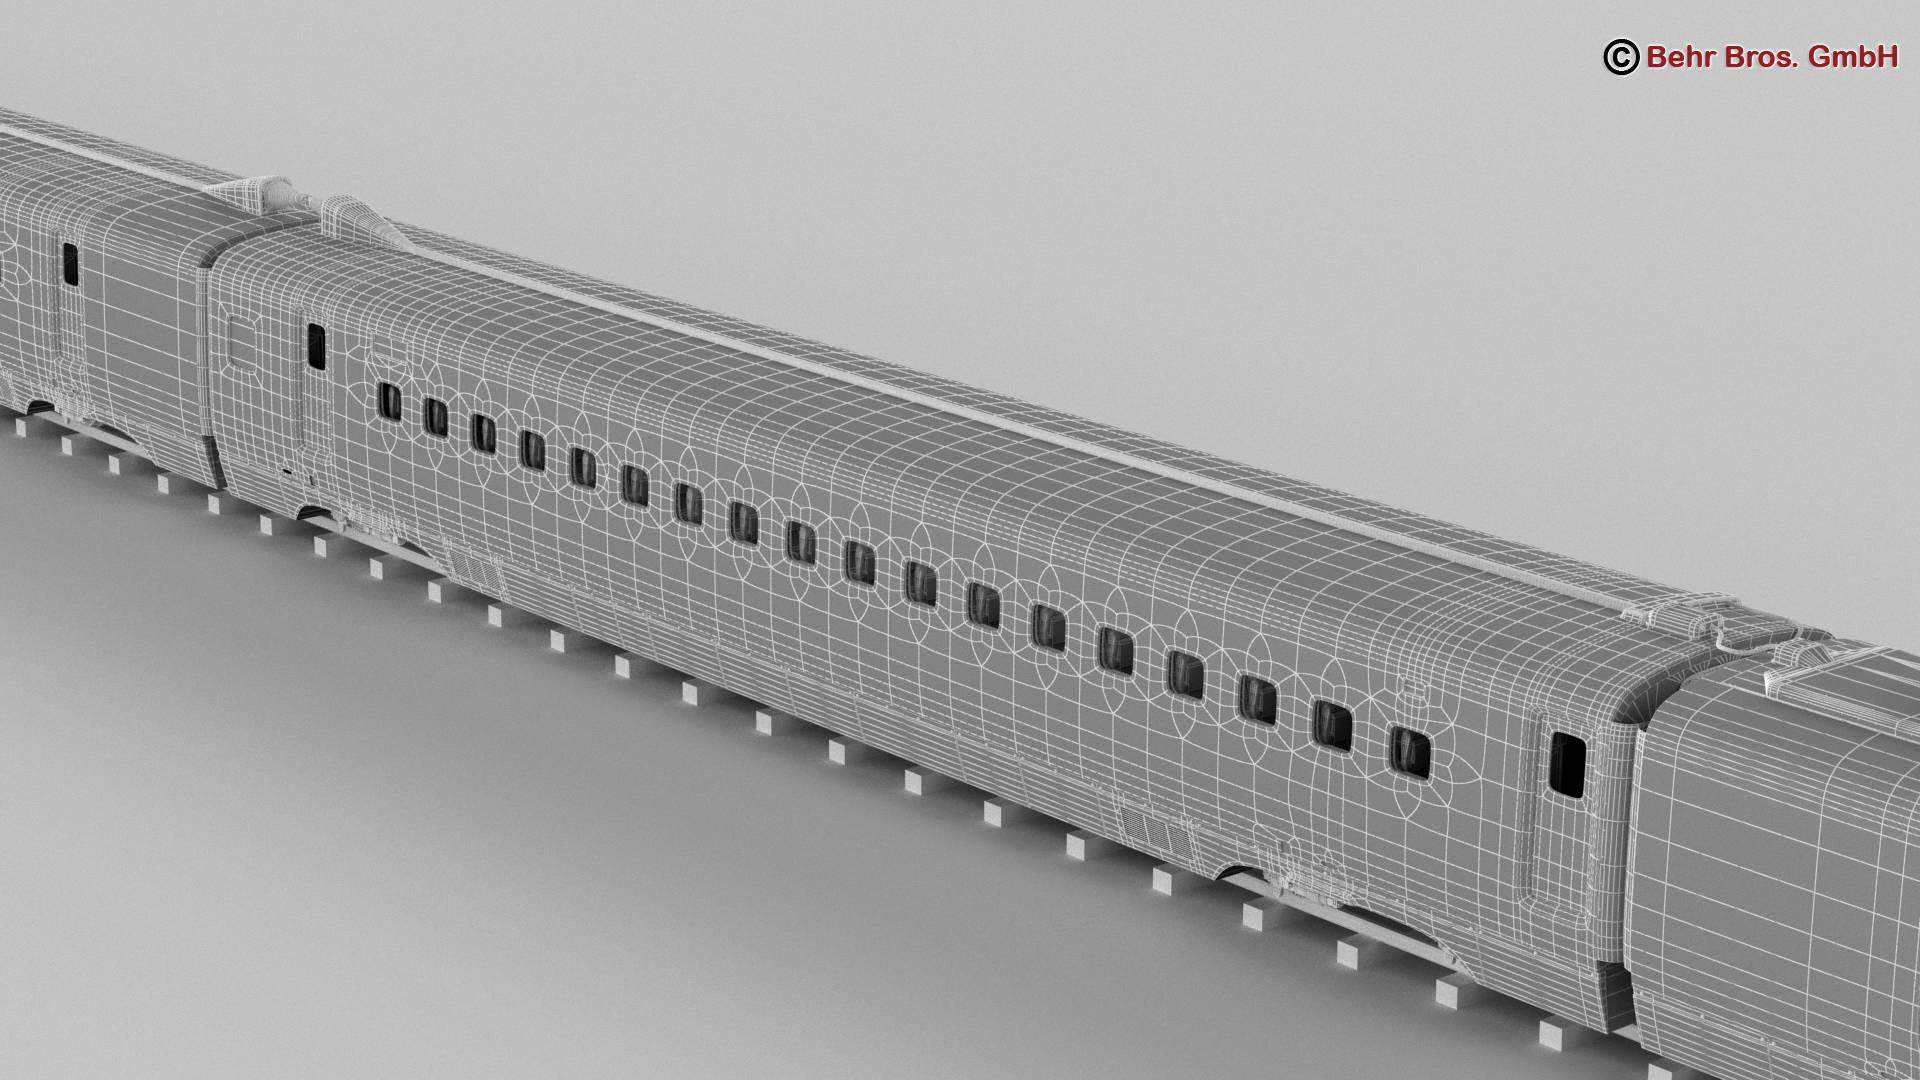 shinkansen e7 3d model 3ds max fbx c4d lwo ma mb obj 265677